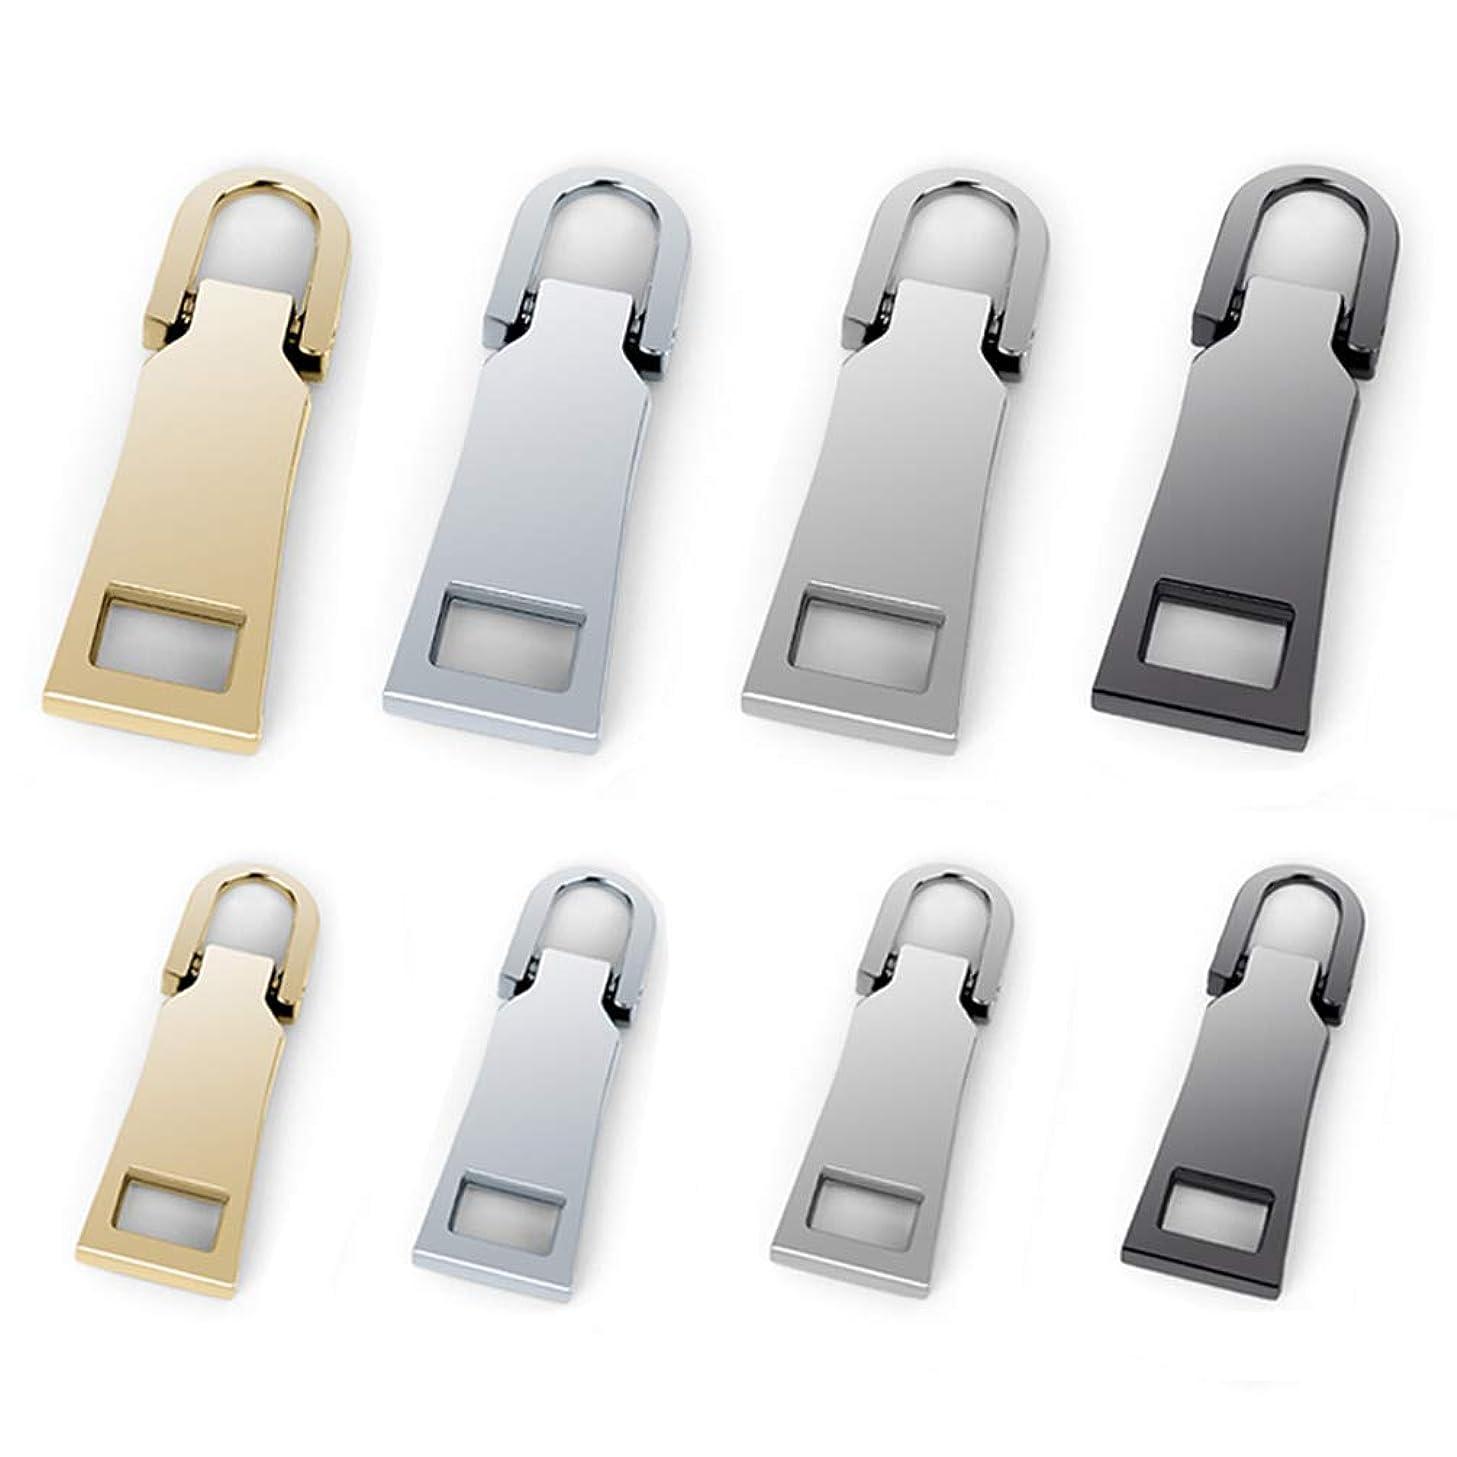 Zipper Pulls #5#3 8PCS - 4 Colors Metal Zipper Fixer Repair Replacement Pullers Metal-Plated Kits Zipper Sliders Zipper Pullers for Backpack Suitcase Jacket Bags Coat by FENGWANGLI